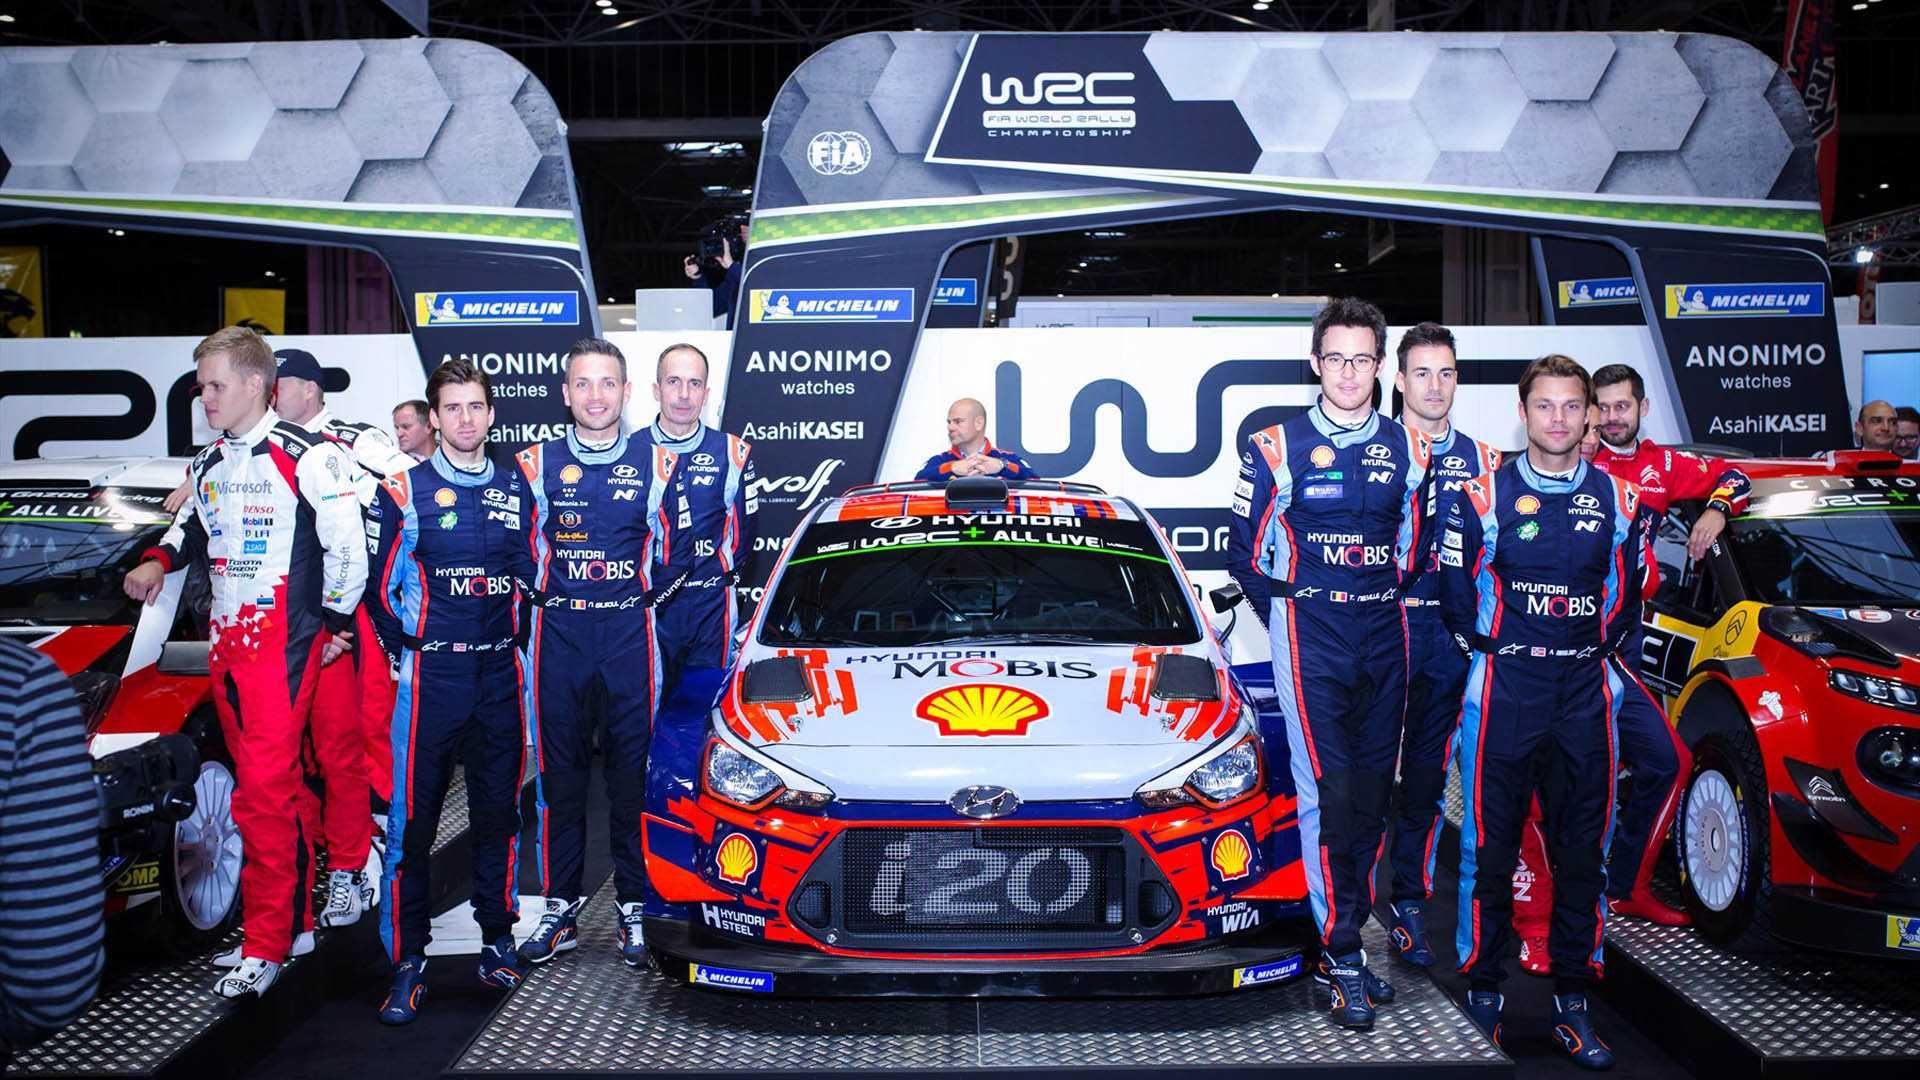 WRC Montecarlo 3